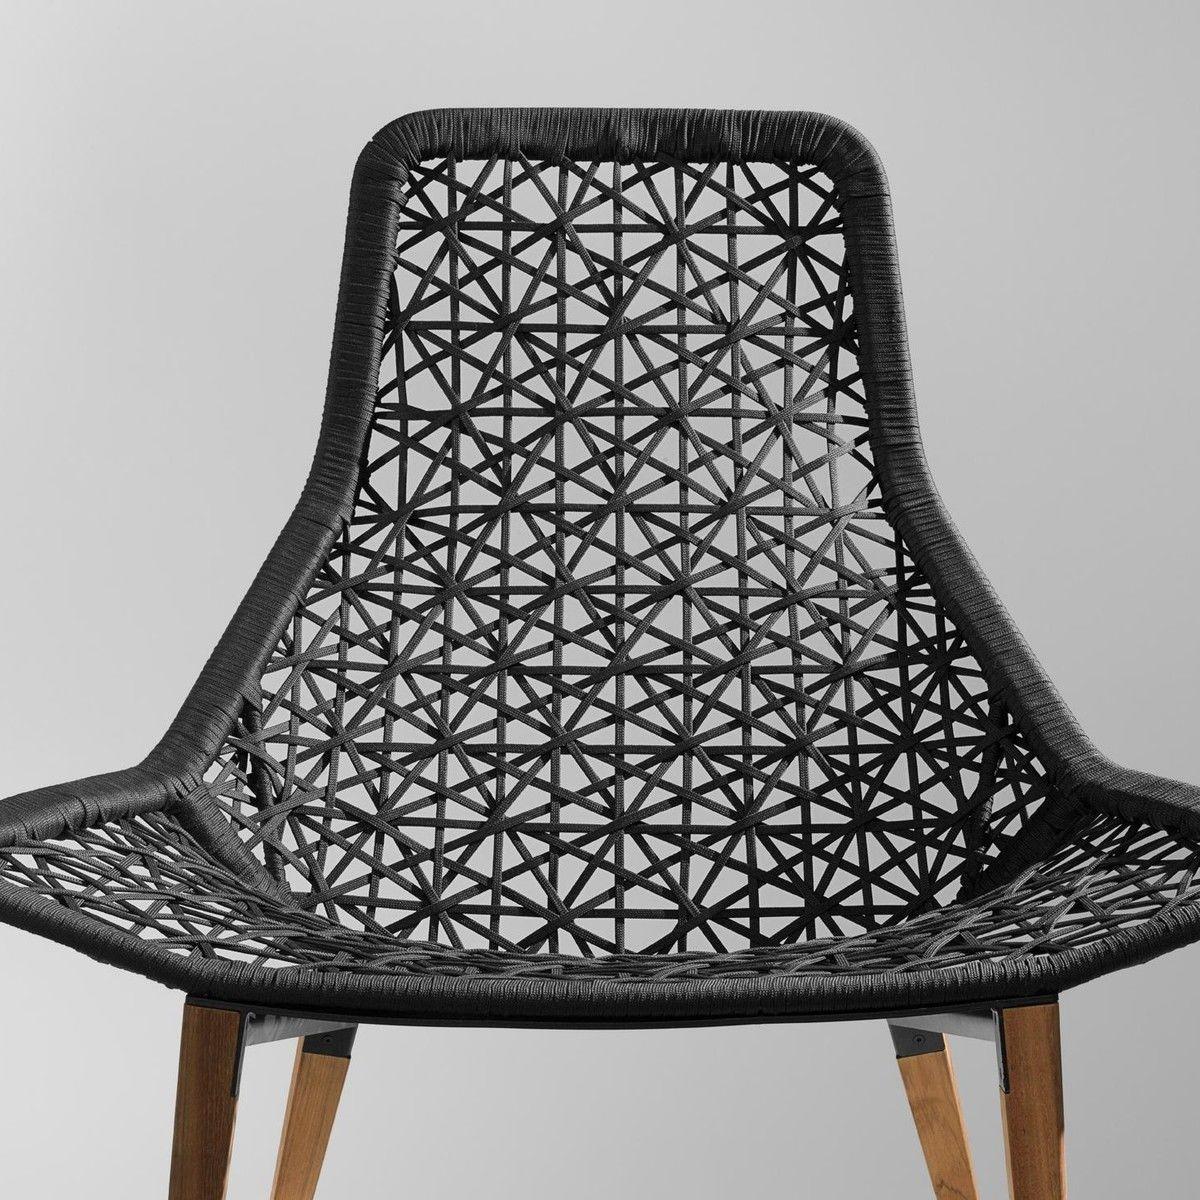 Chaise De Jardin Kettal - Amazing Home Ideas - freetattoosdesign.us